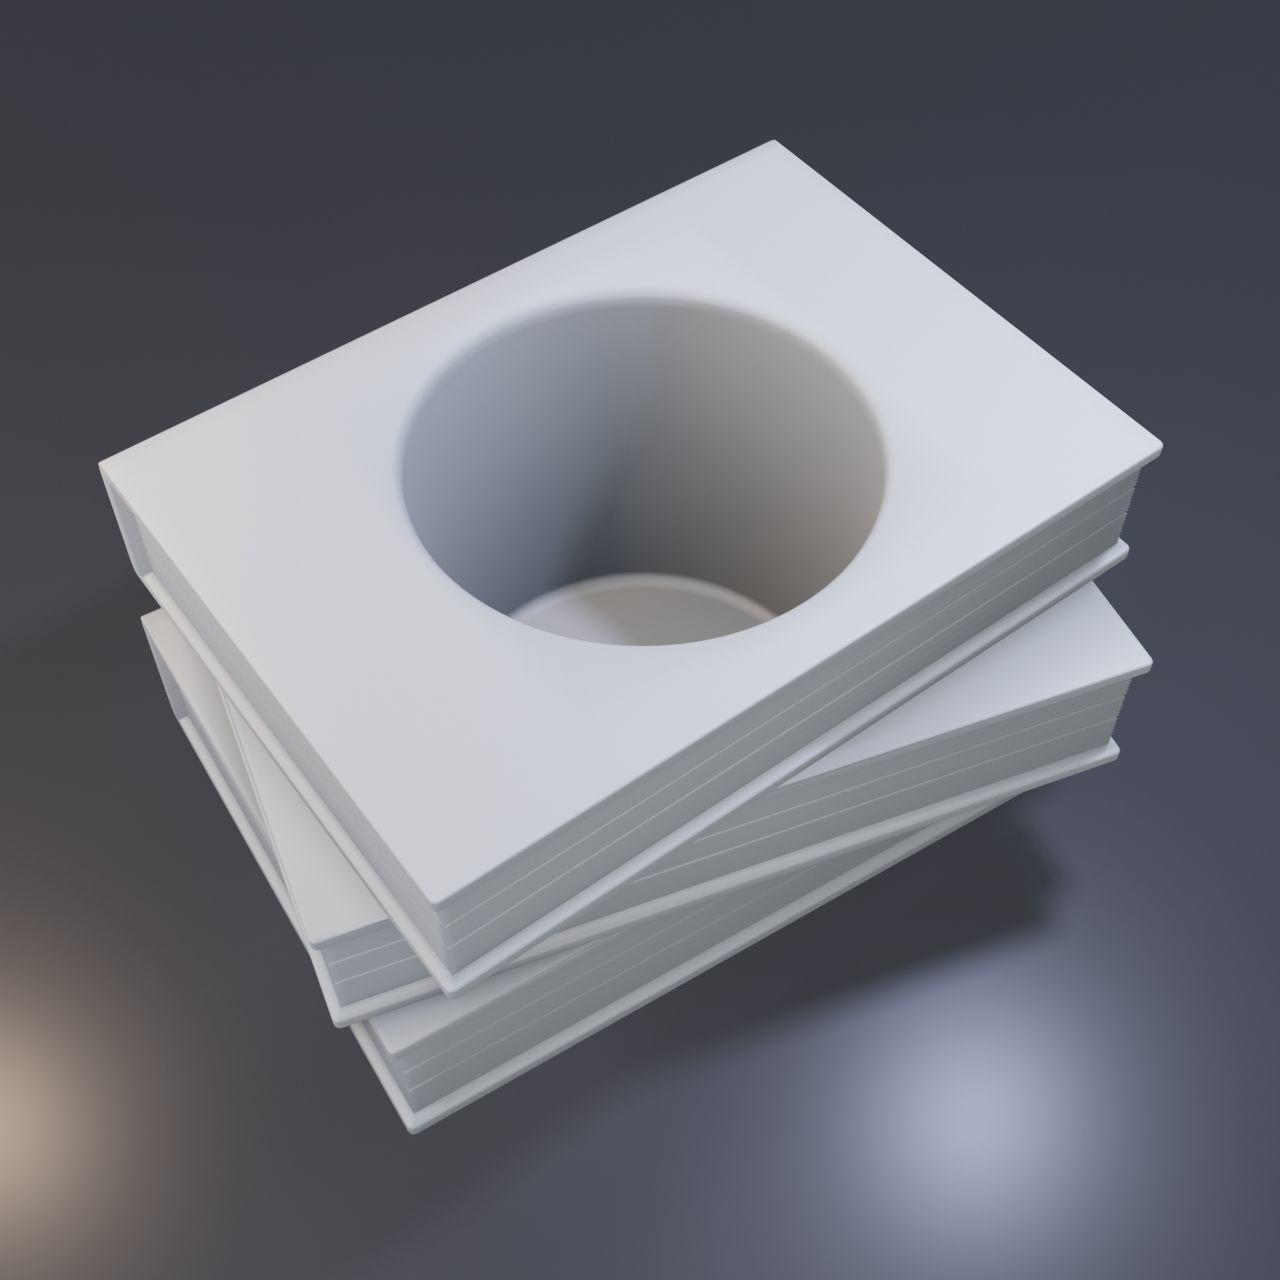 Three books with a hole